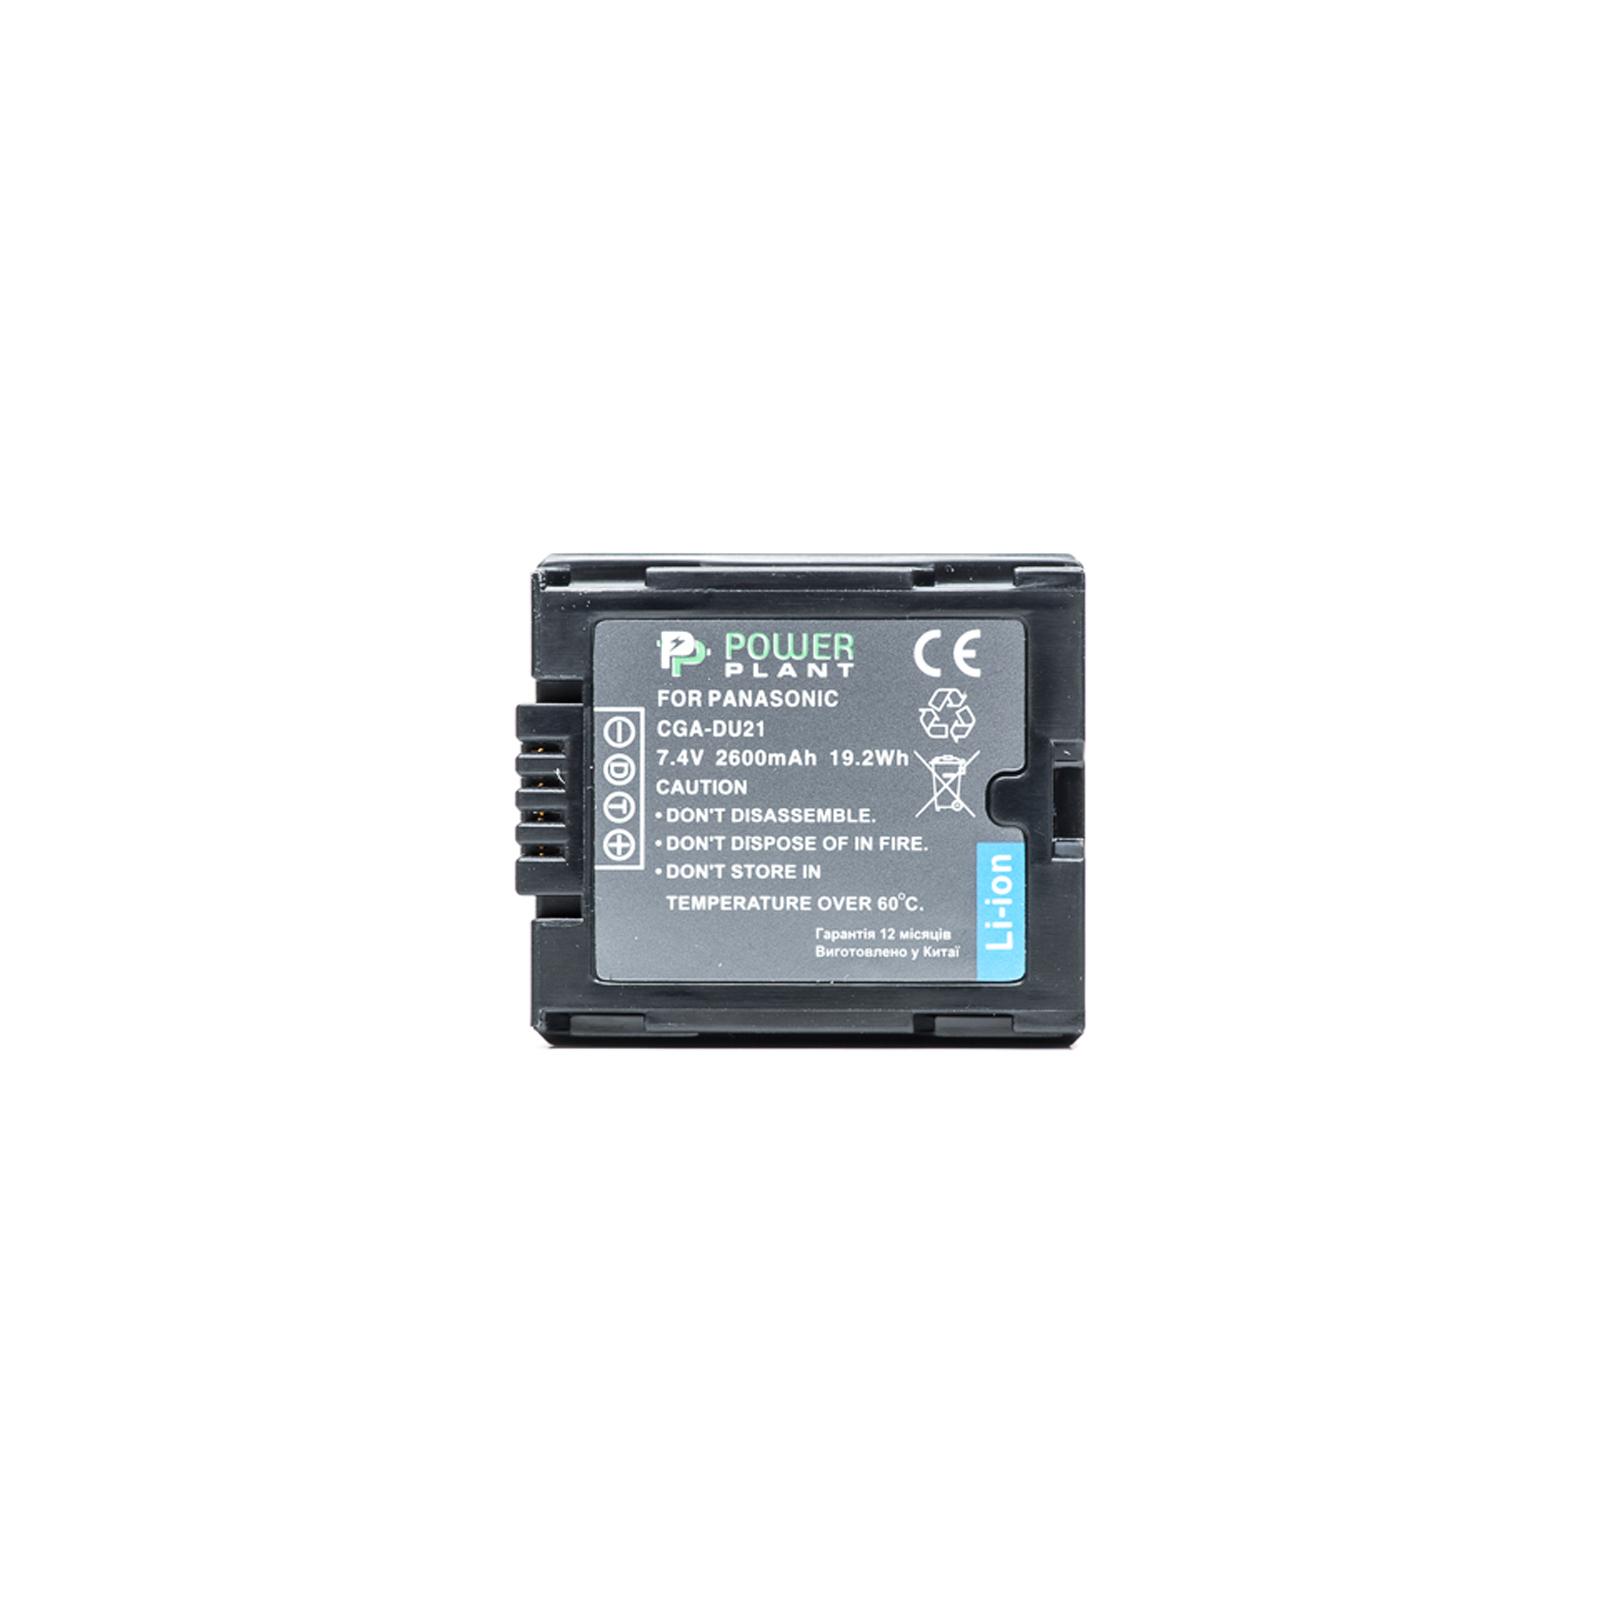 Аккумулятор к фото/видео PowerPlant Panasonic VBD210, CGA-DU21 (DV00DV1092) изображение 2